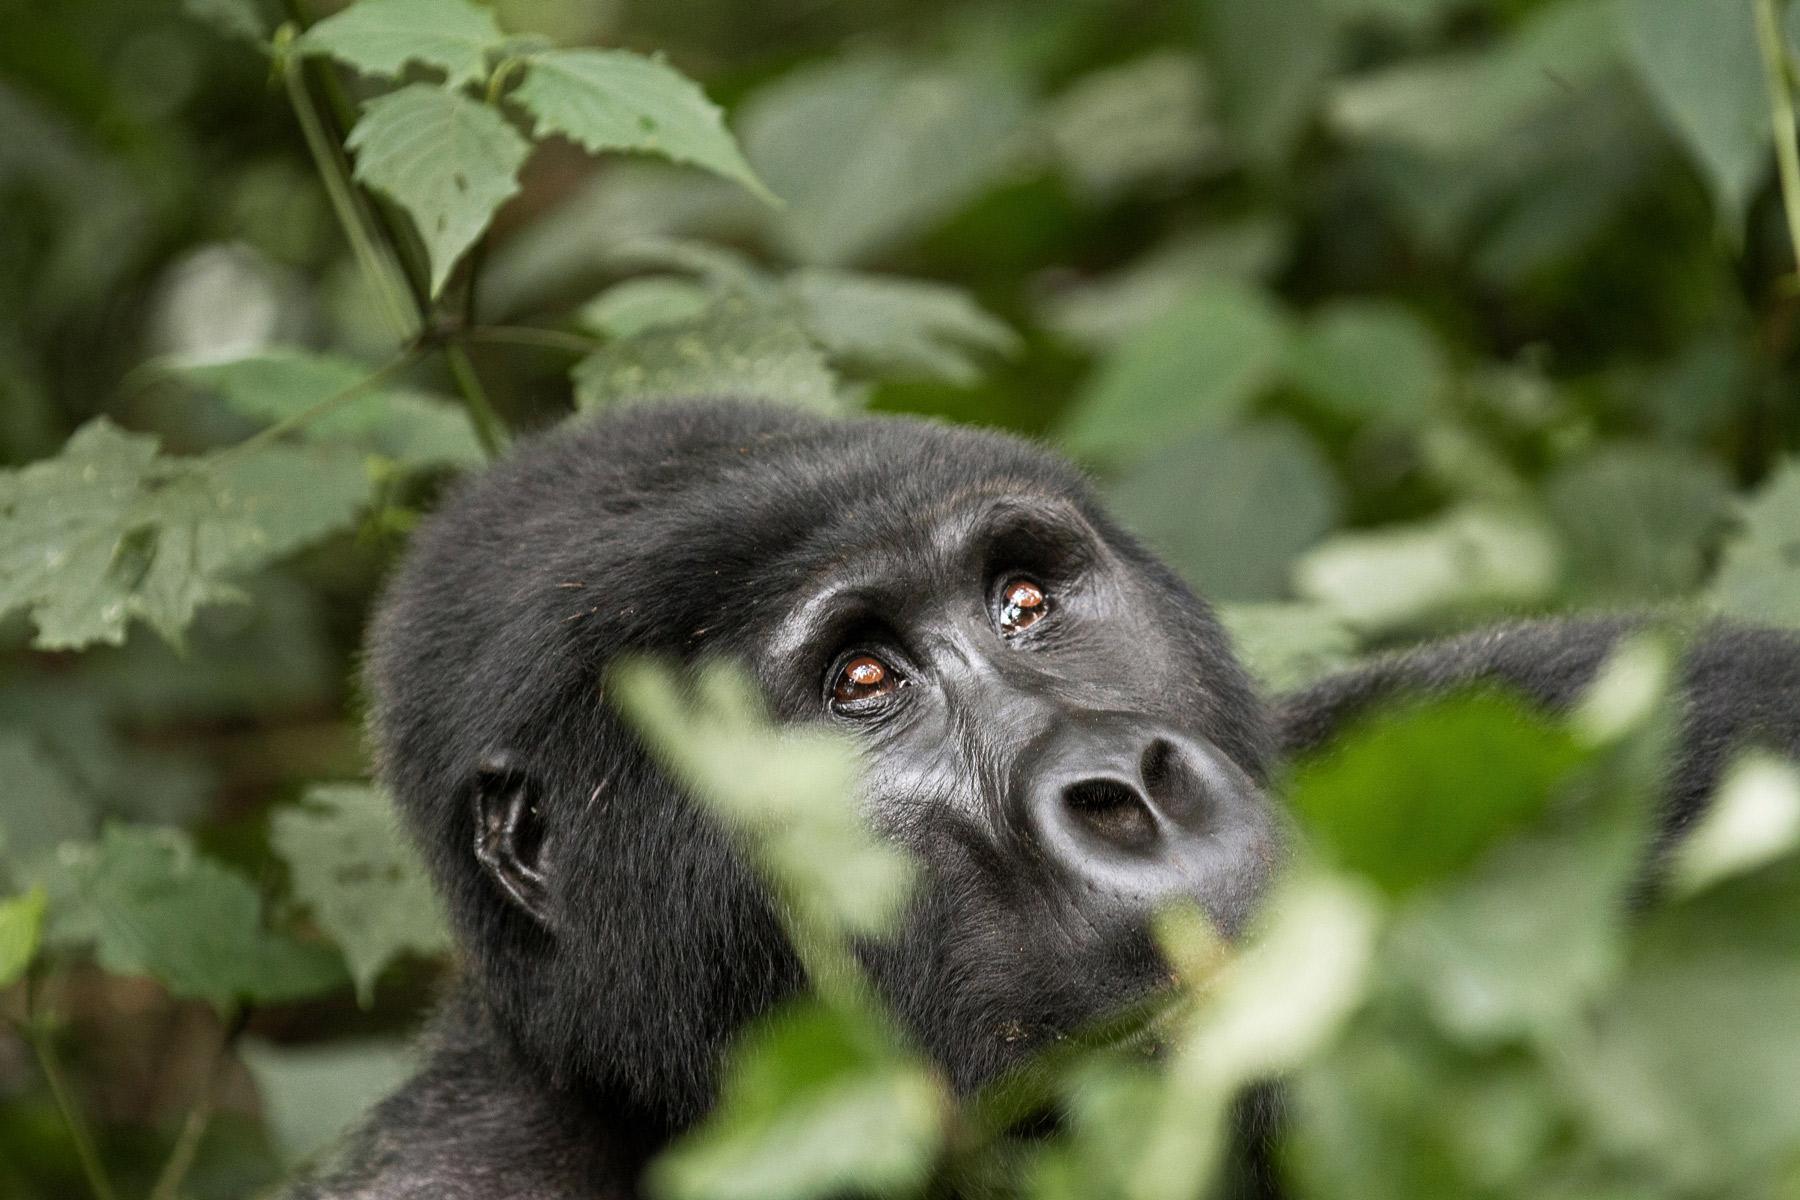 A gorilla looking upwards